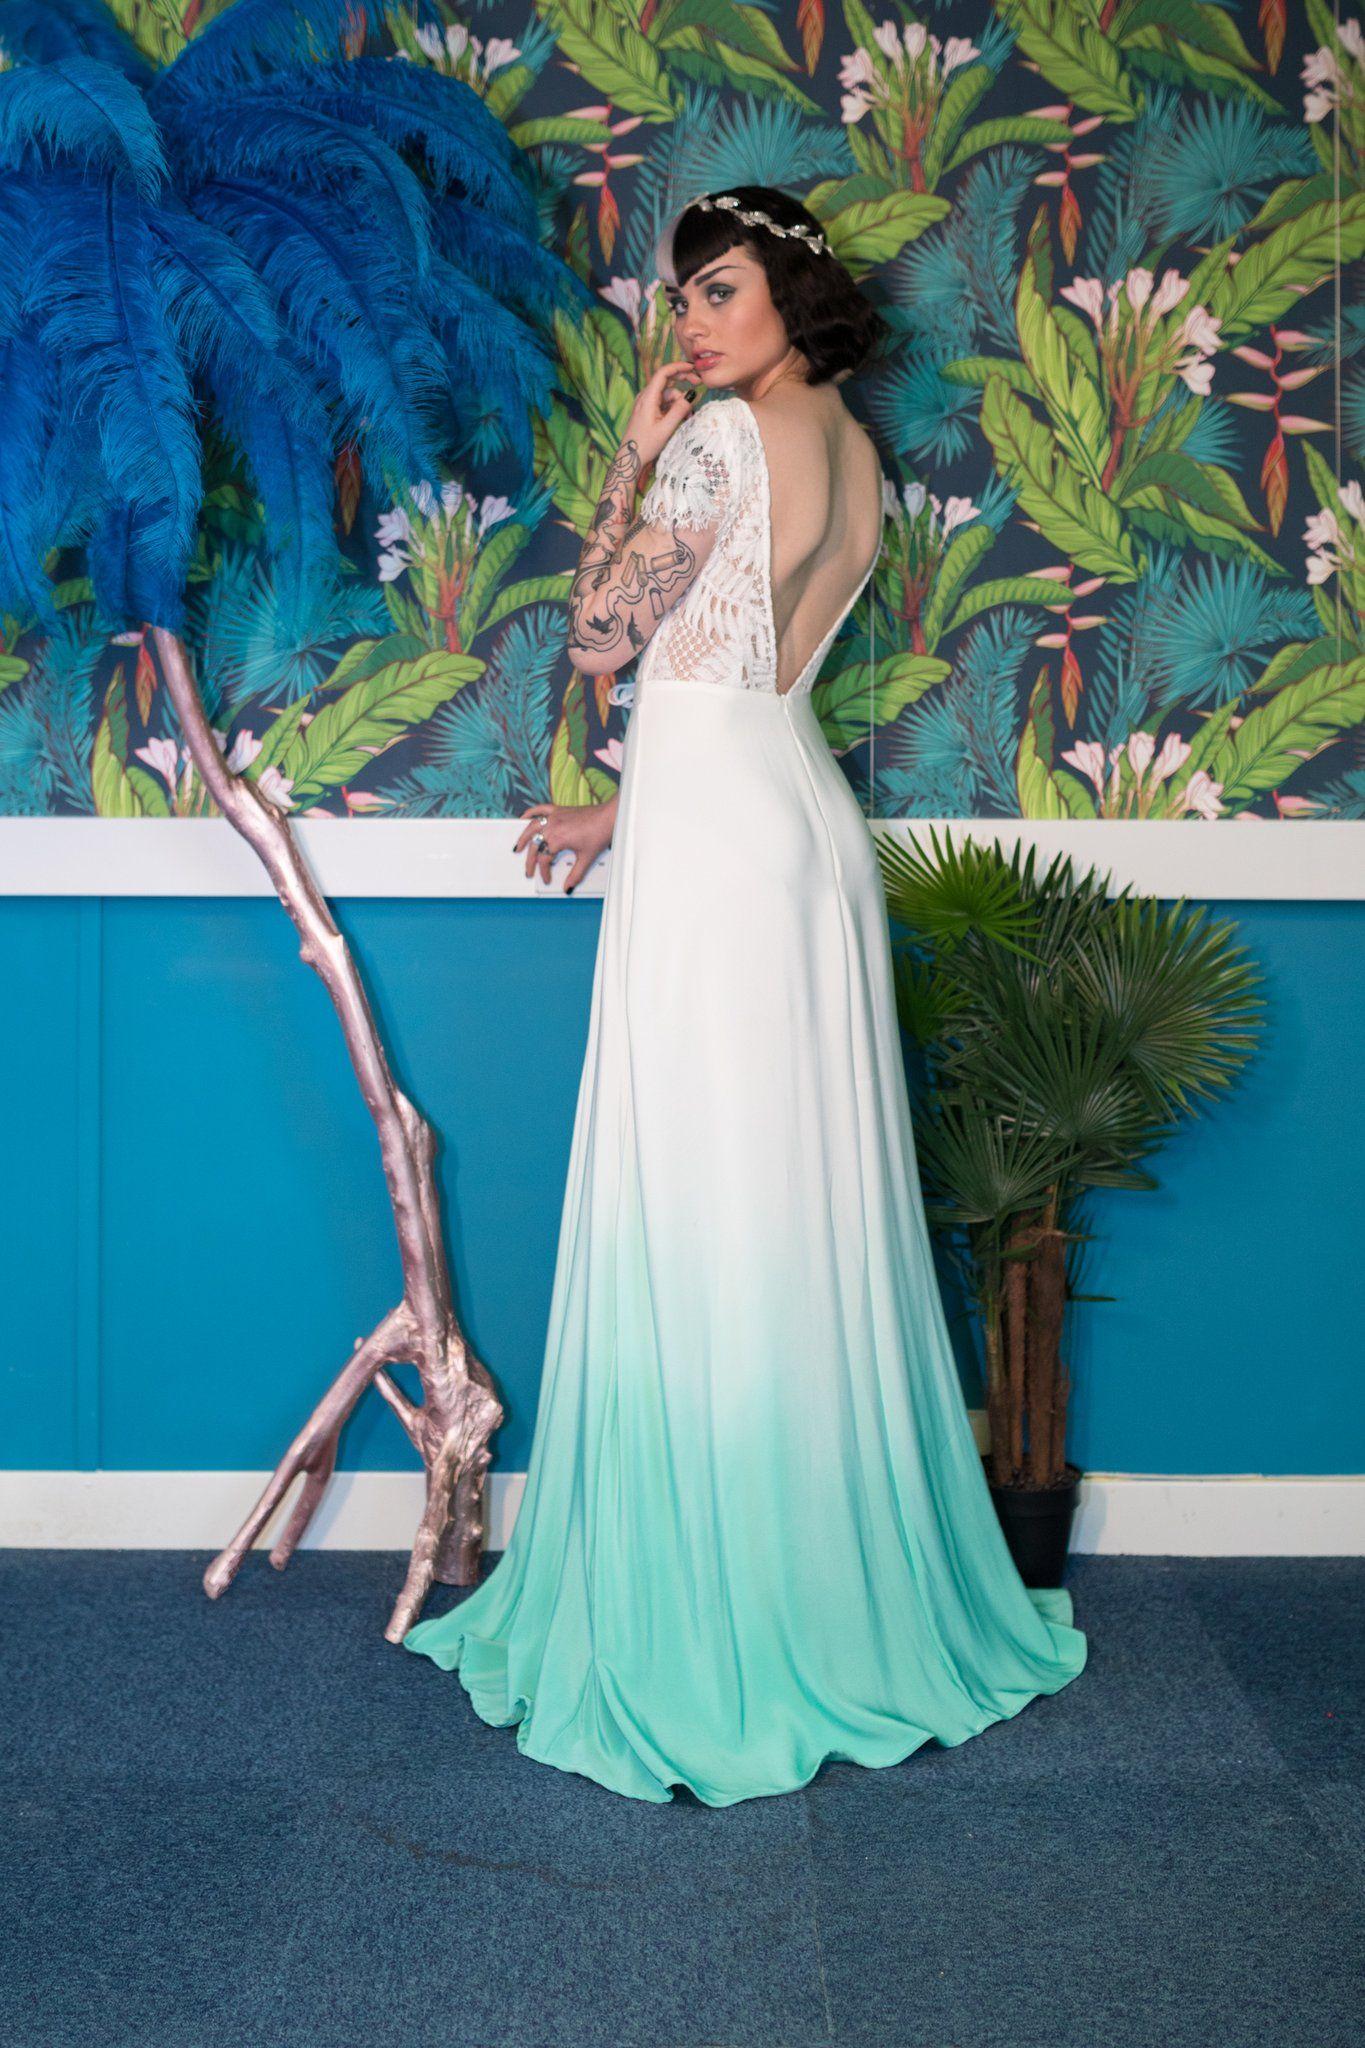 Pin by Lauren Mirelli on wedding dresses   Pinterest   Dip dye ...